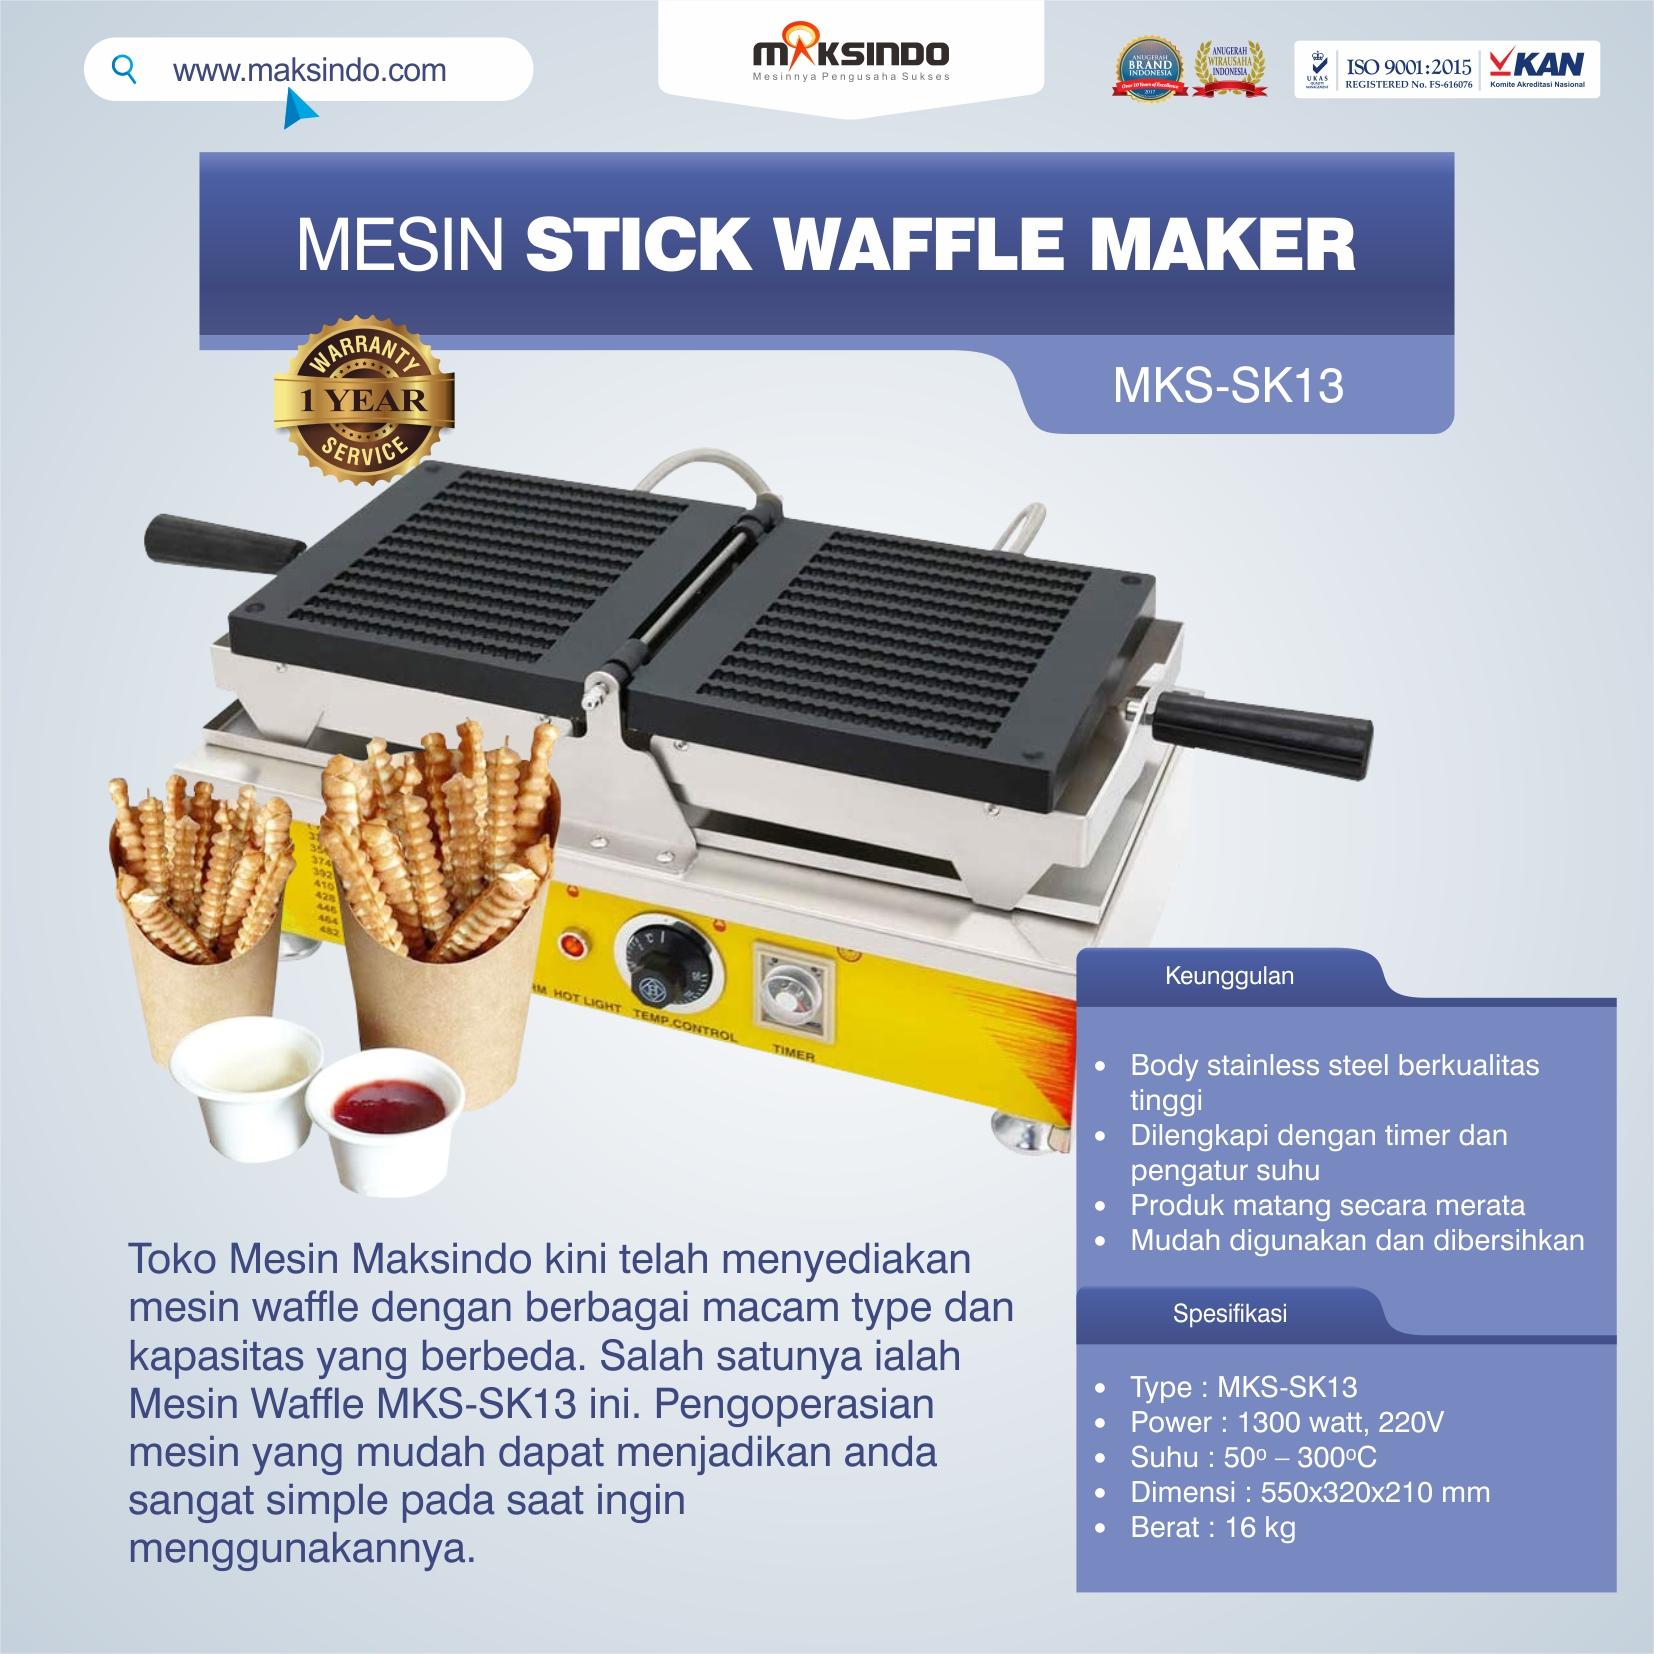 Jual Mesin Stick Waffle Maker MKS-SK13 di Semarang